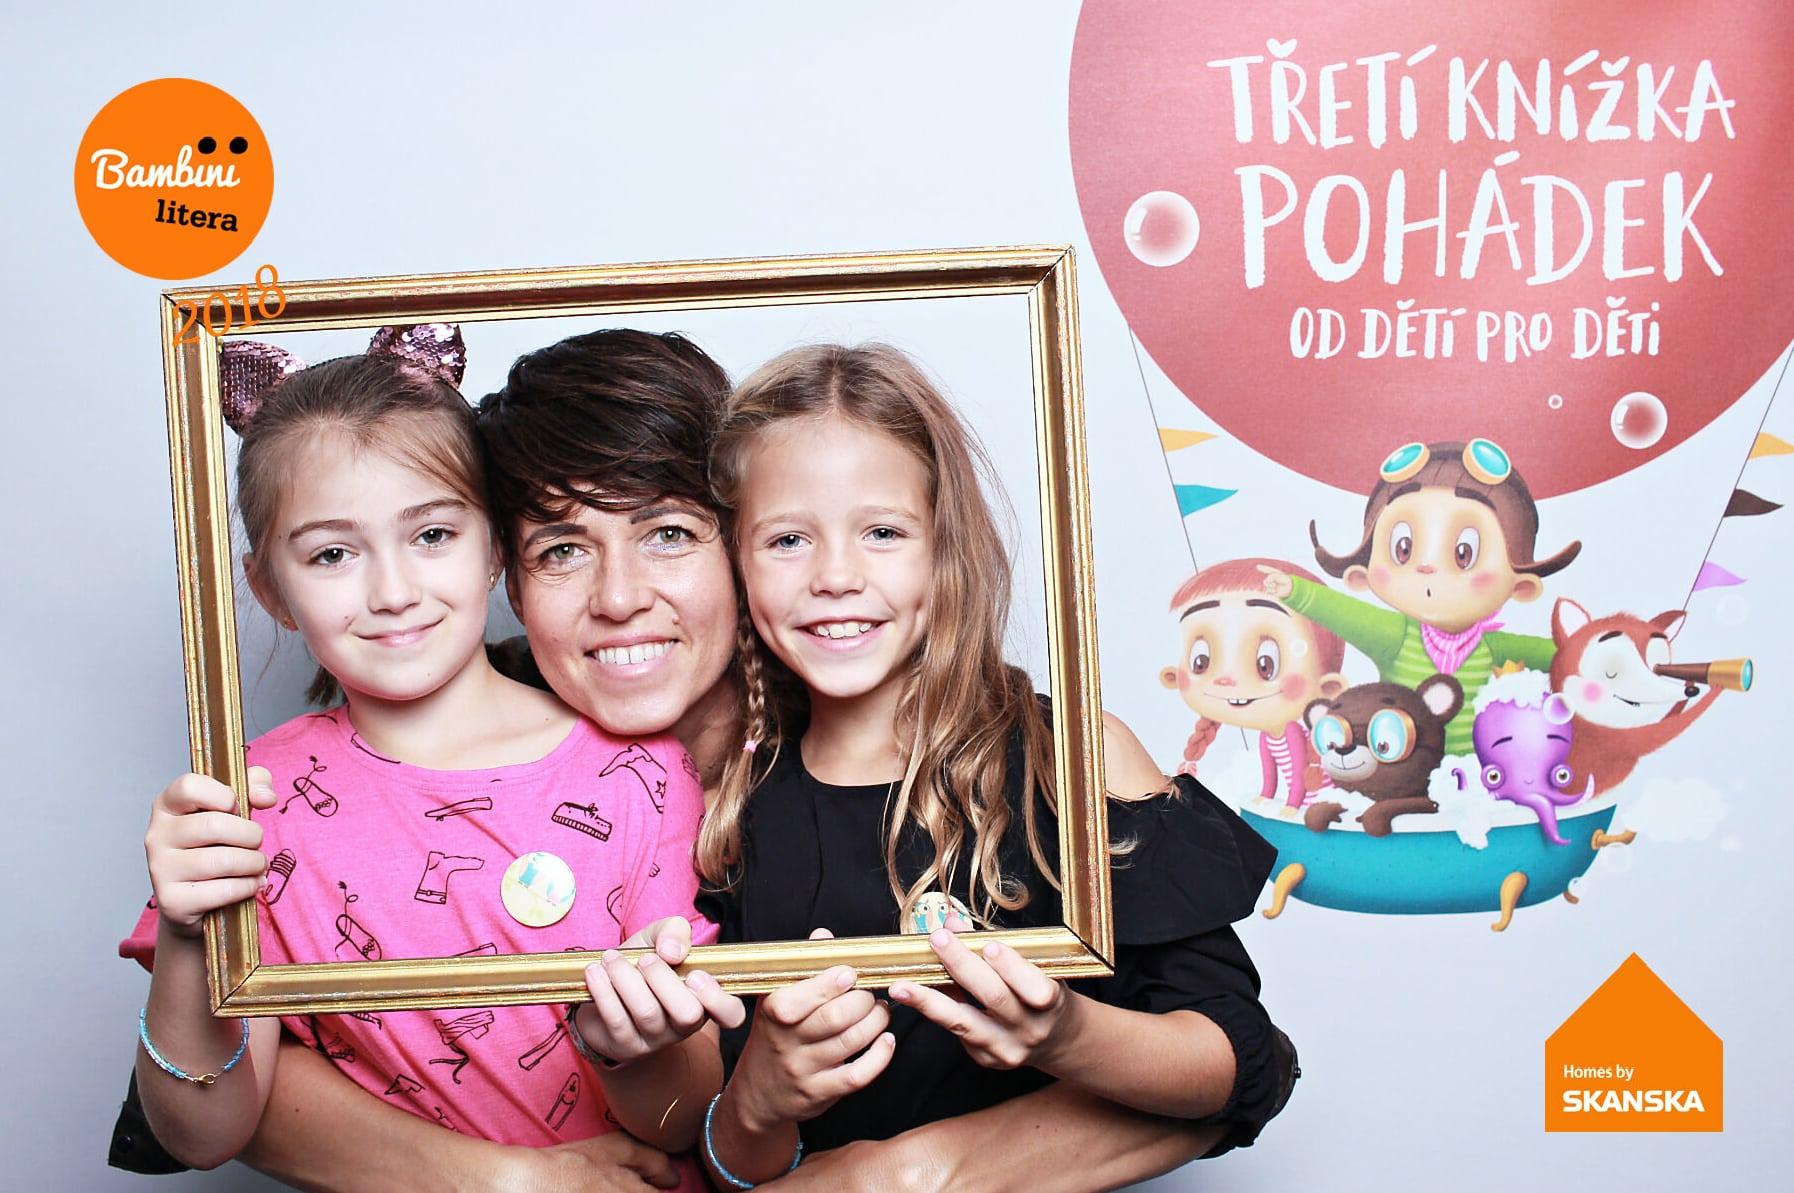 fotokoutek-skanska-bambini-litera-2-9-2018-476890